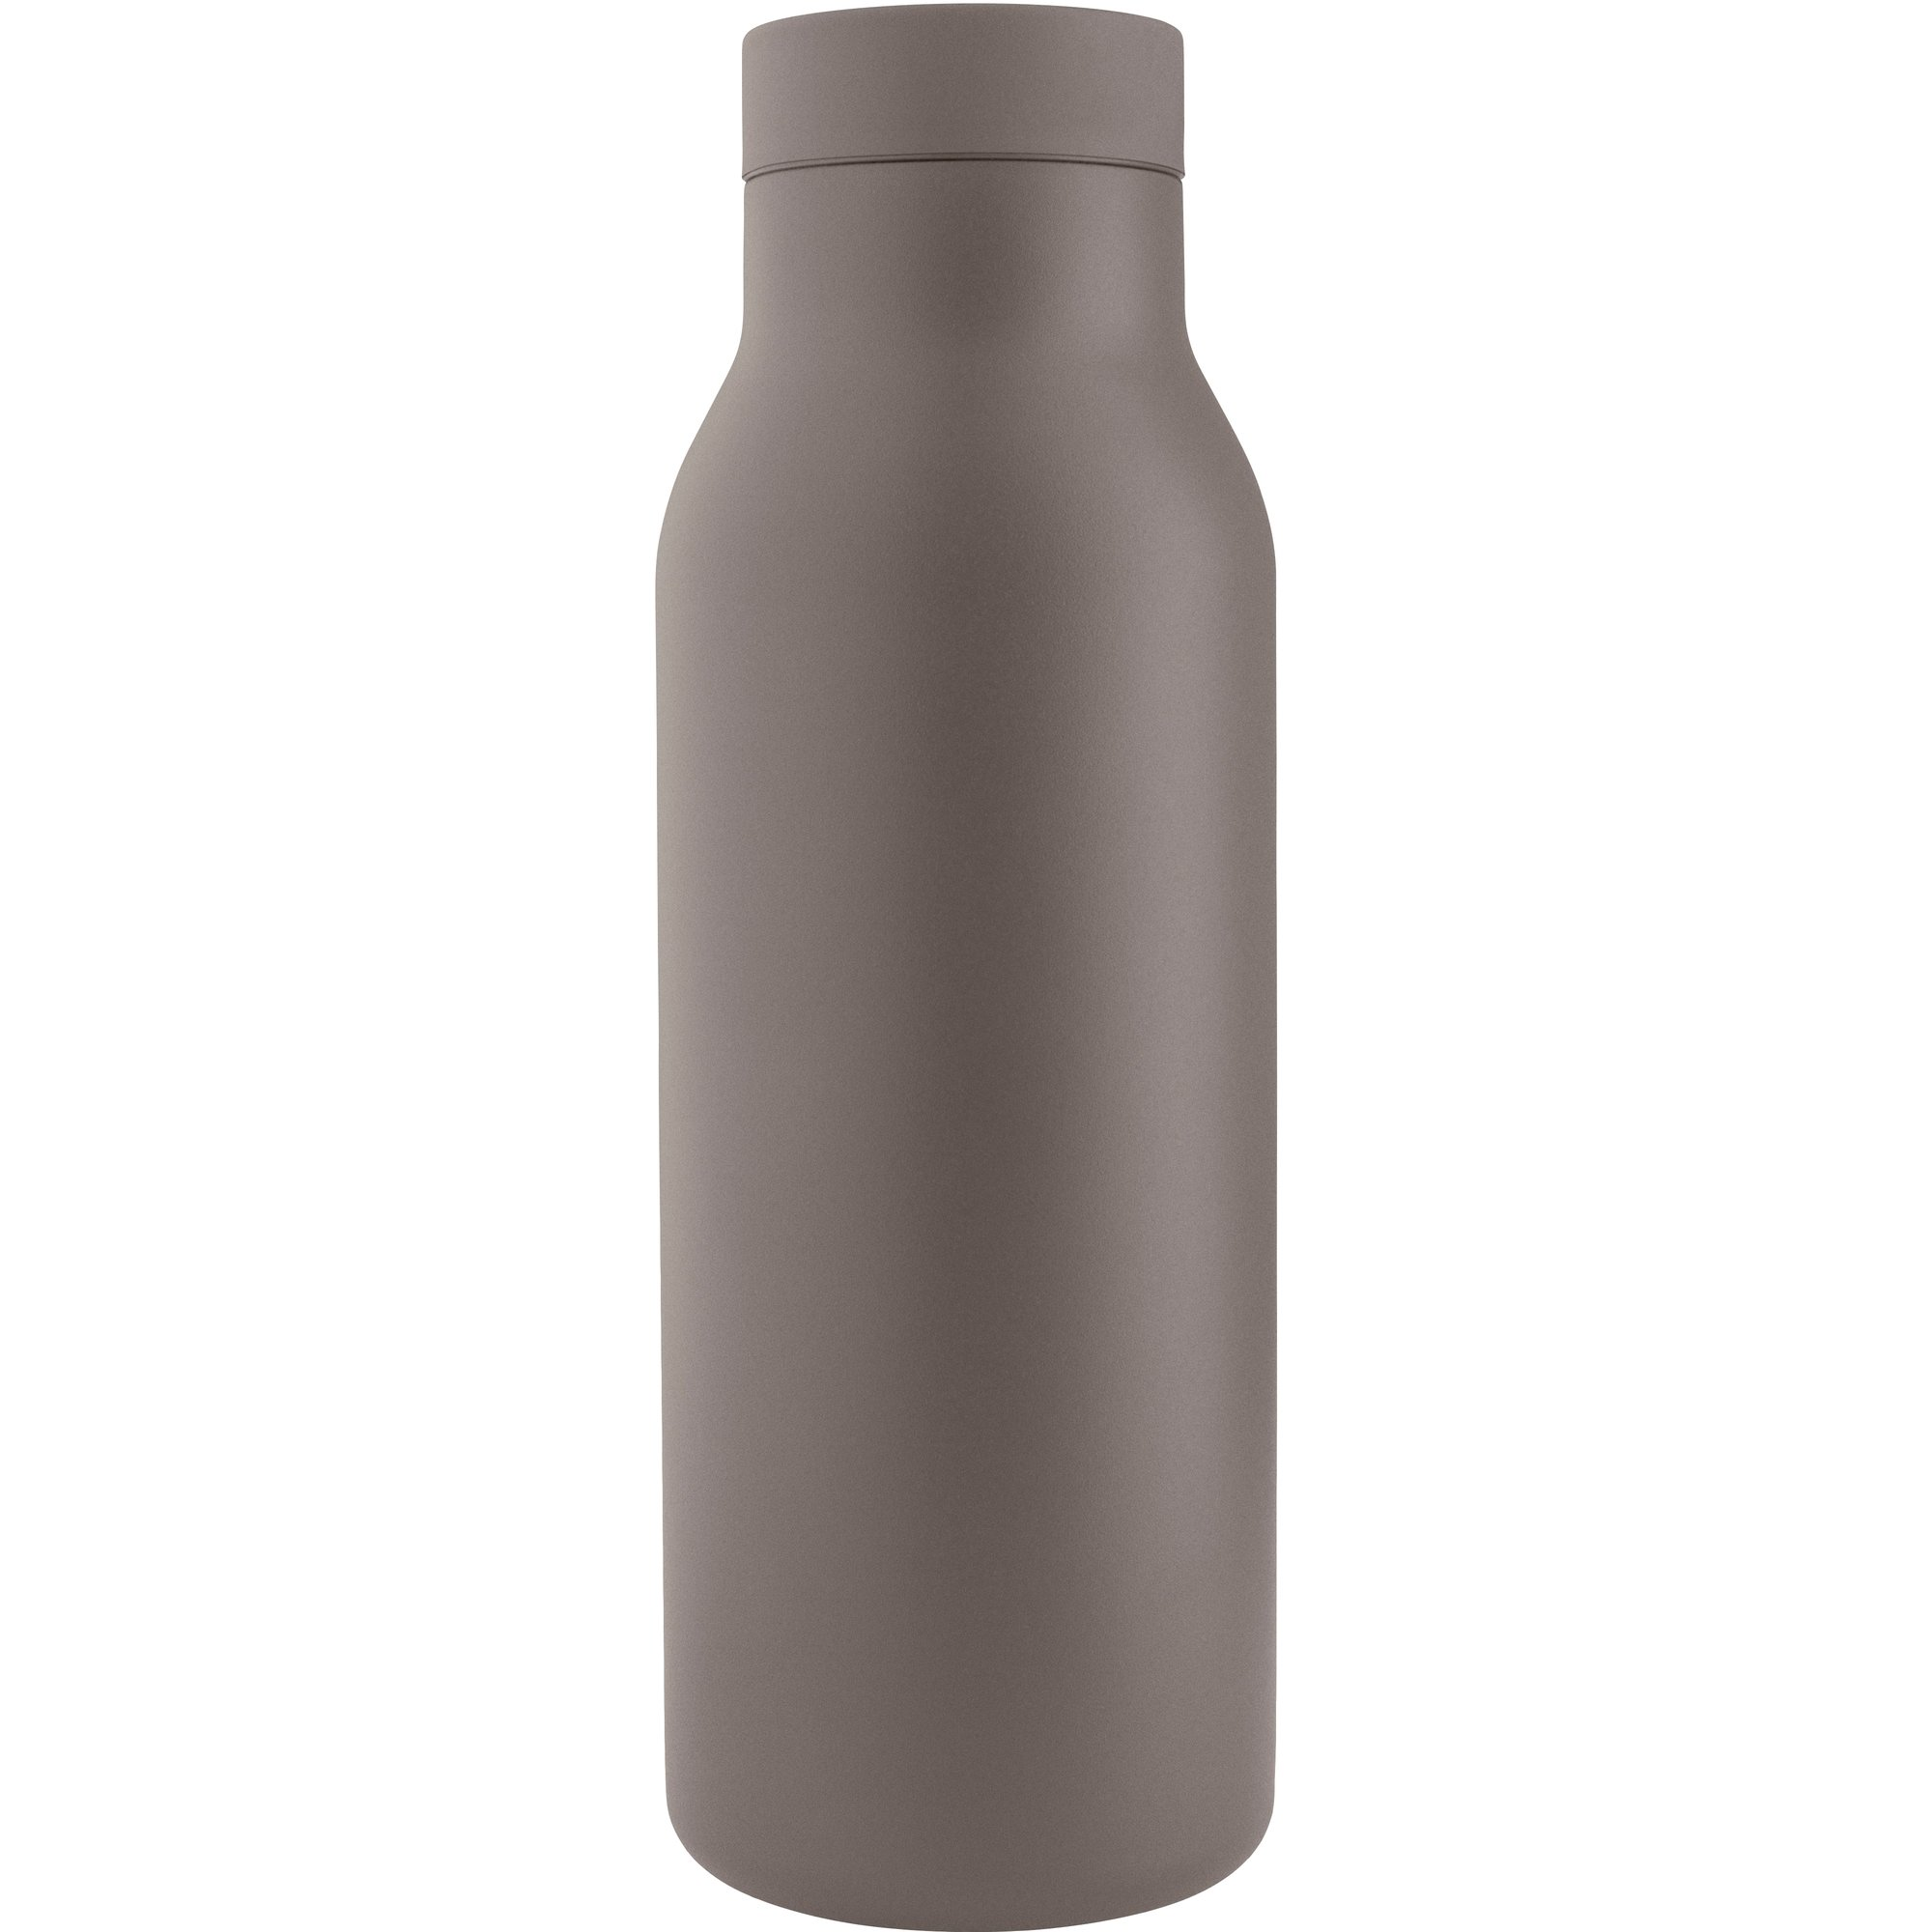 Eva Solo Urban Termosflaska 05 liter taupe